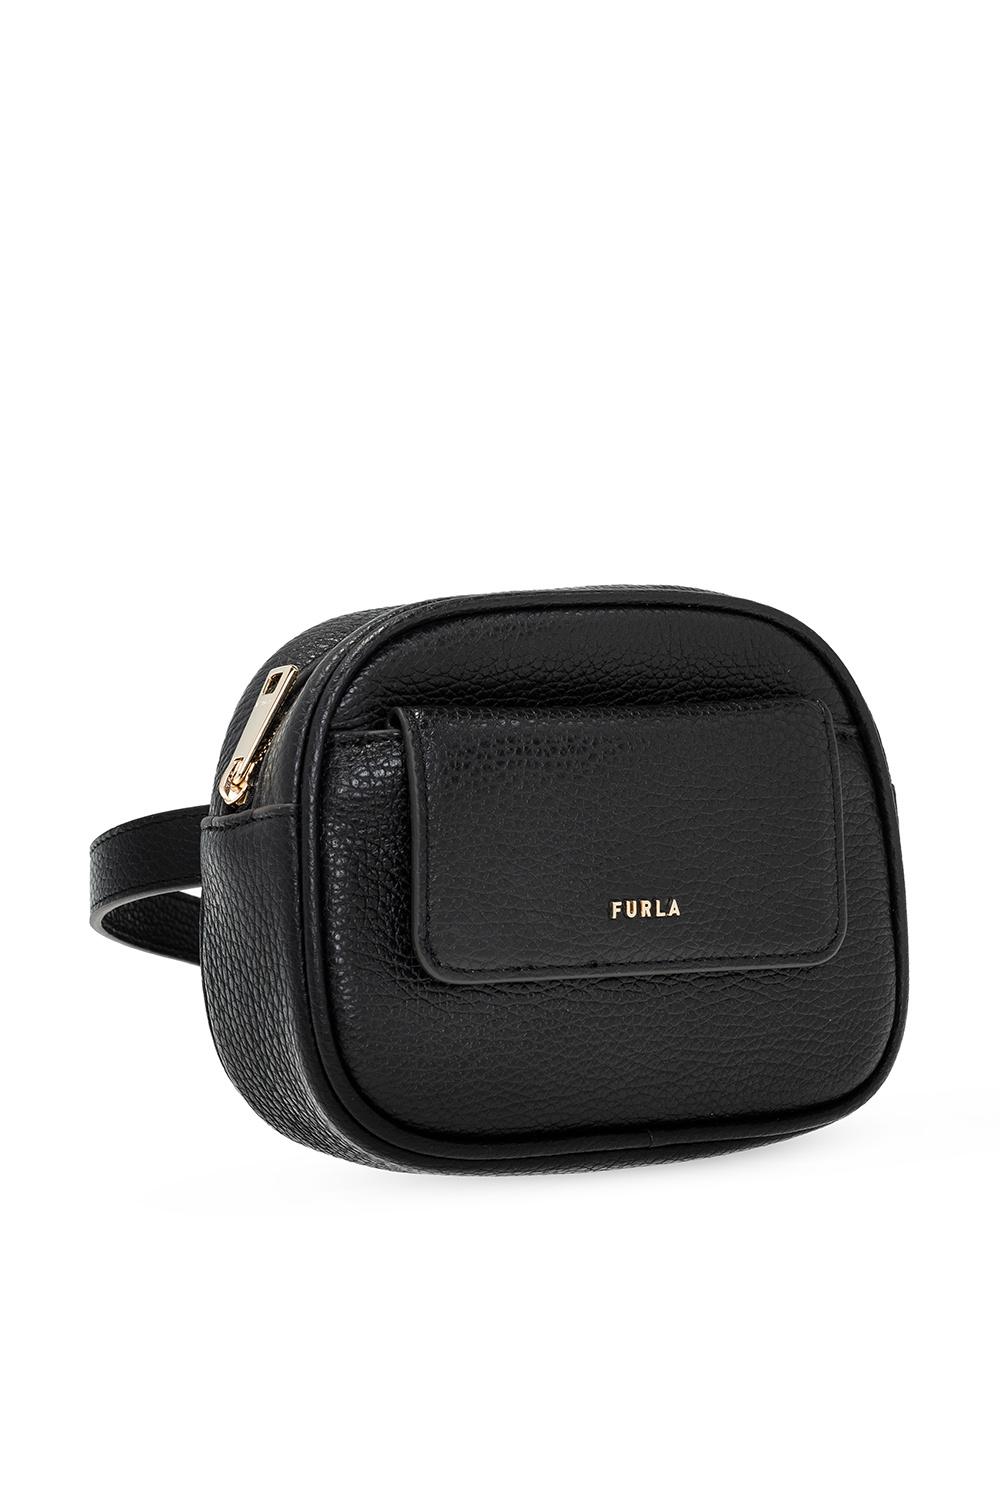 Furla 'Babylon' belt bag